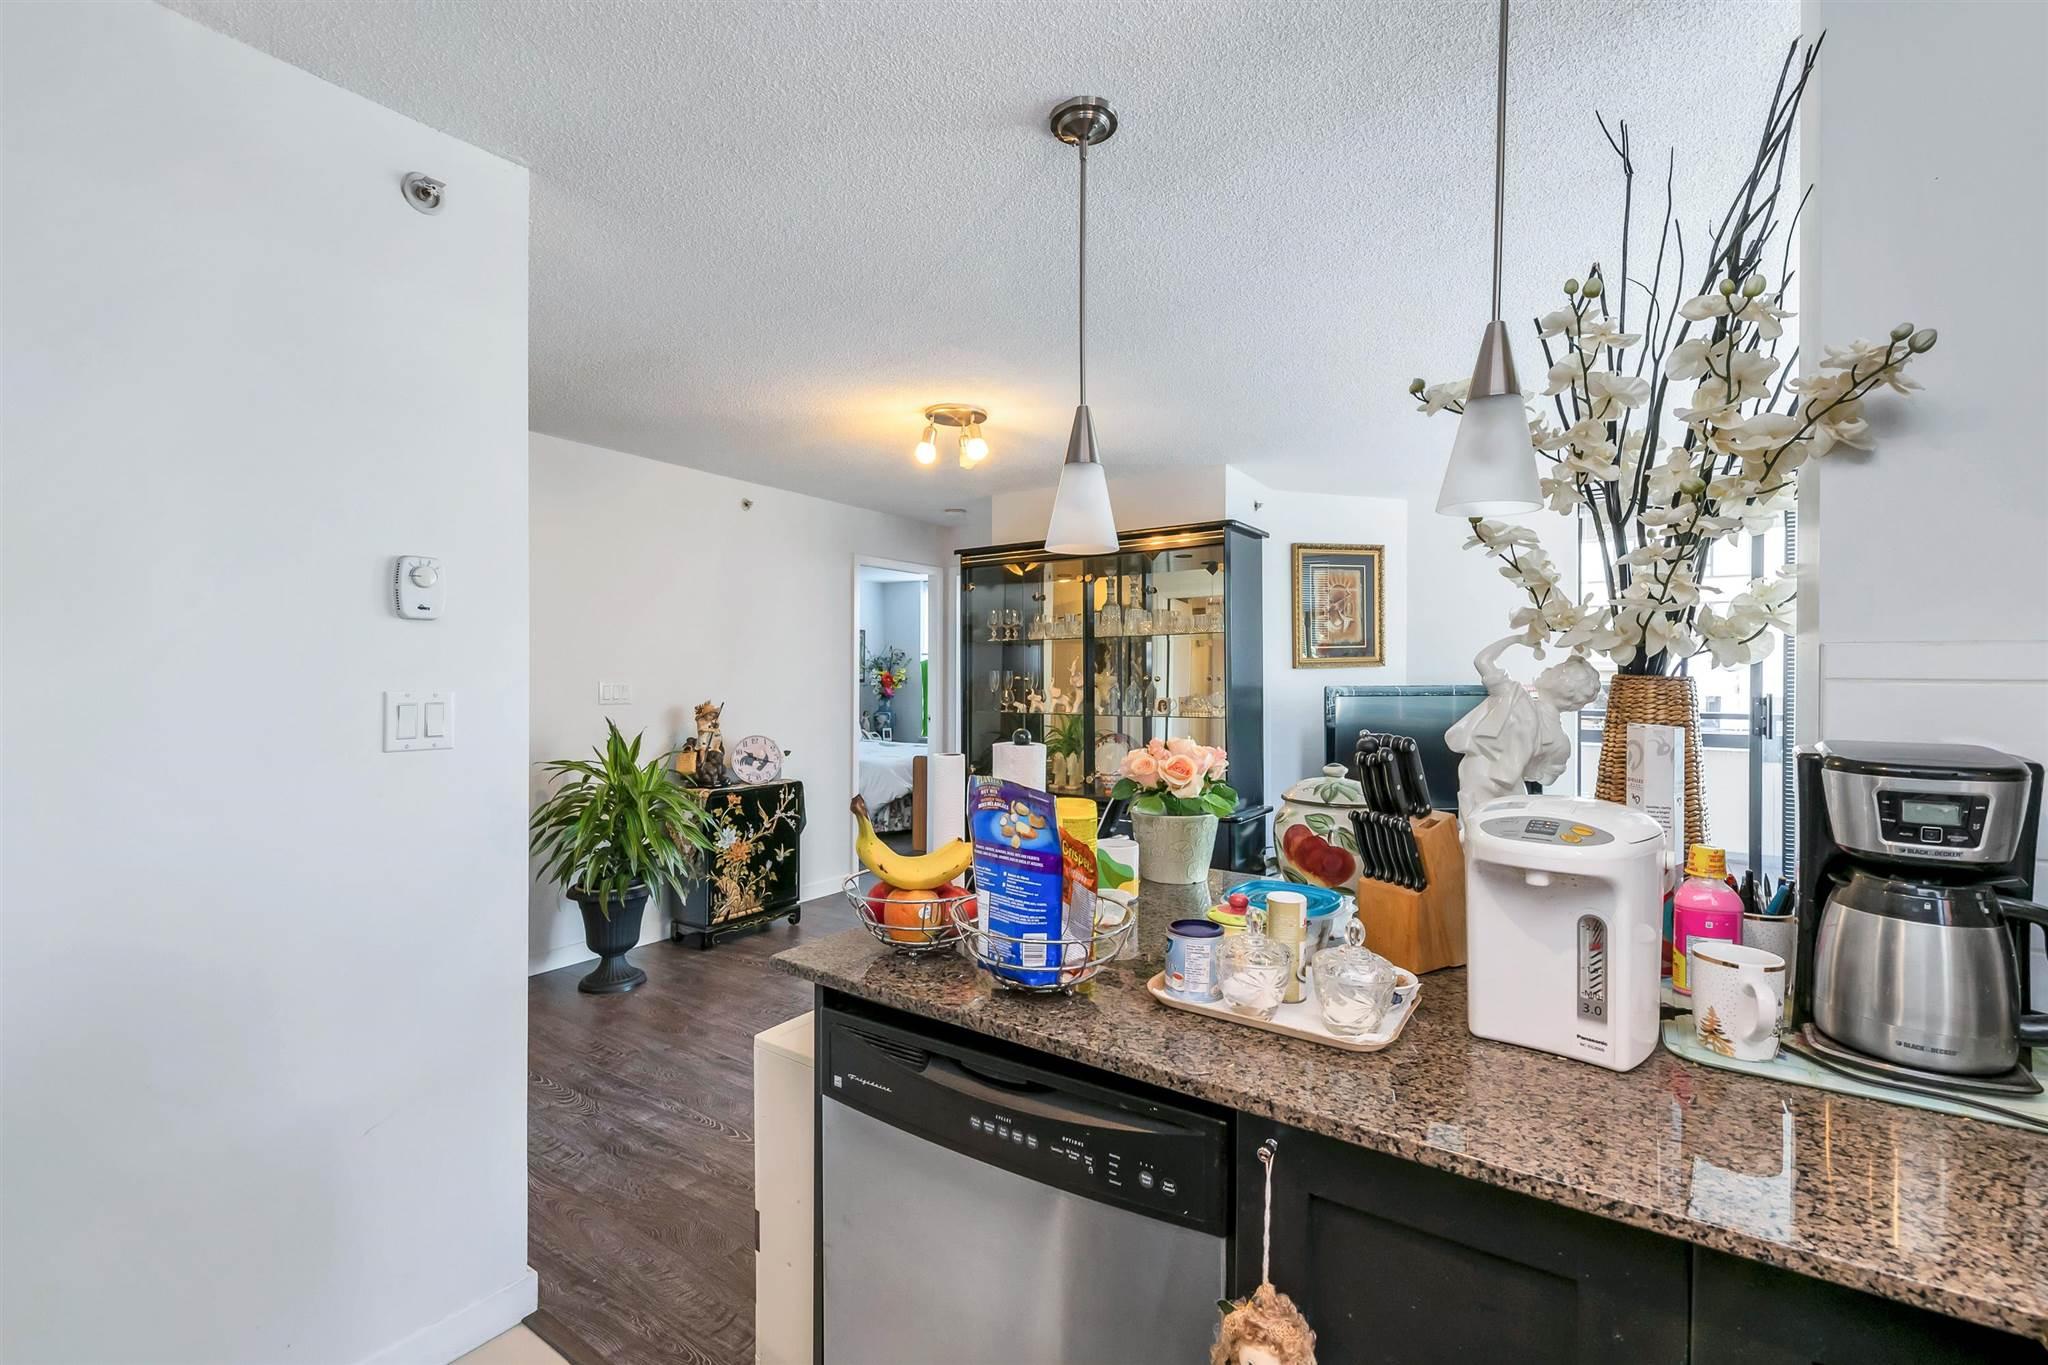 205 7225 ACORN AVENUE - Highgate Apartment/Condo for sale, 2 Bedrooms (R2606454) - #7